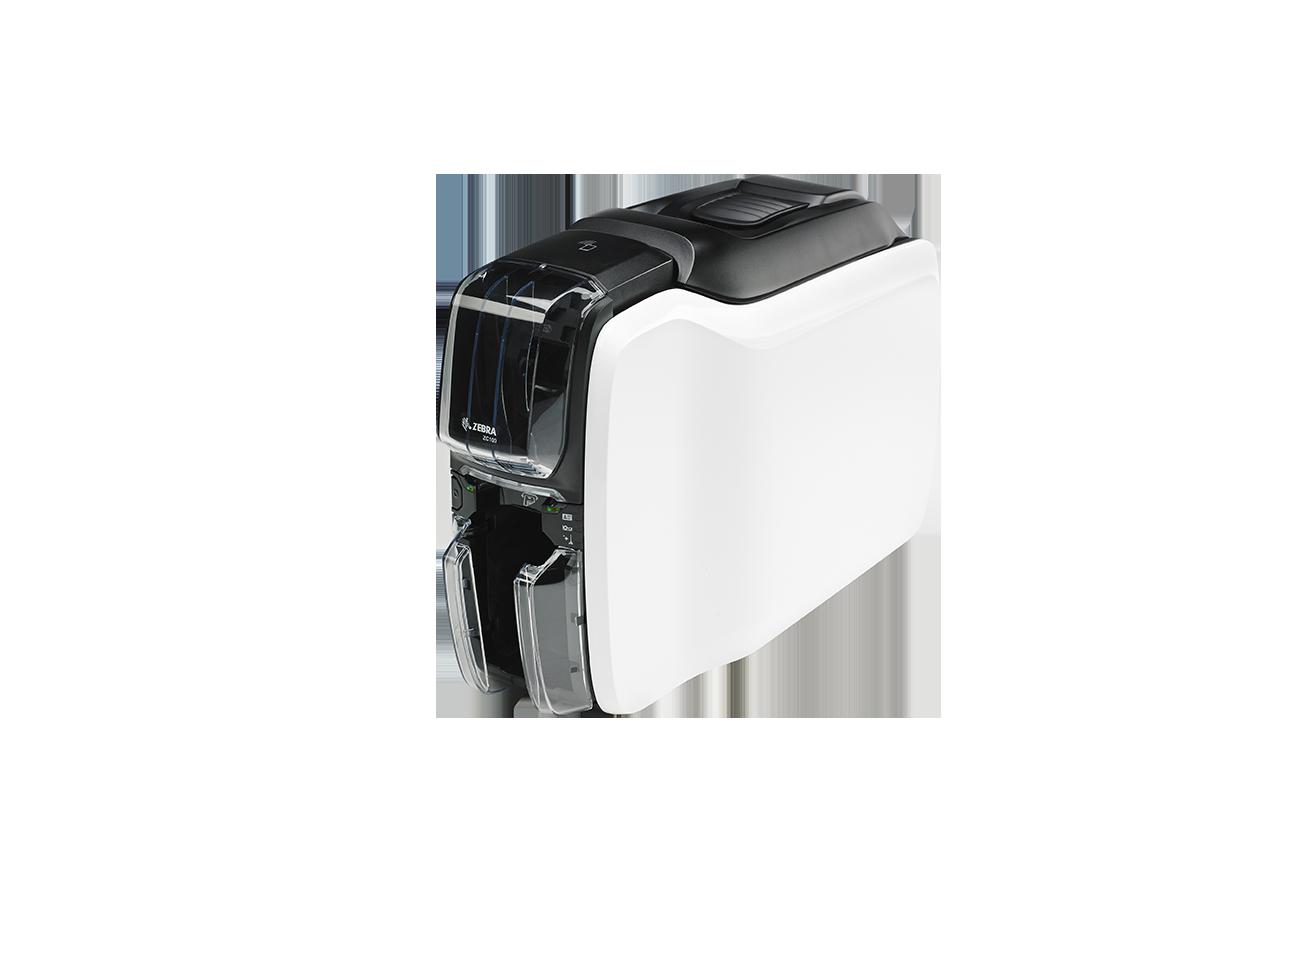 Zebra - tiskárna karet - ZC100, Single Sided, USB Only - ZC11-0000000EM00